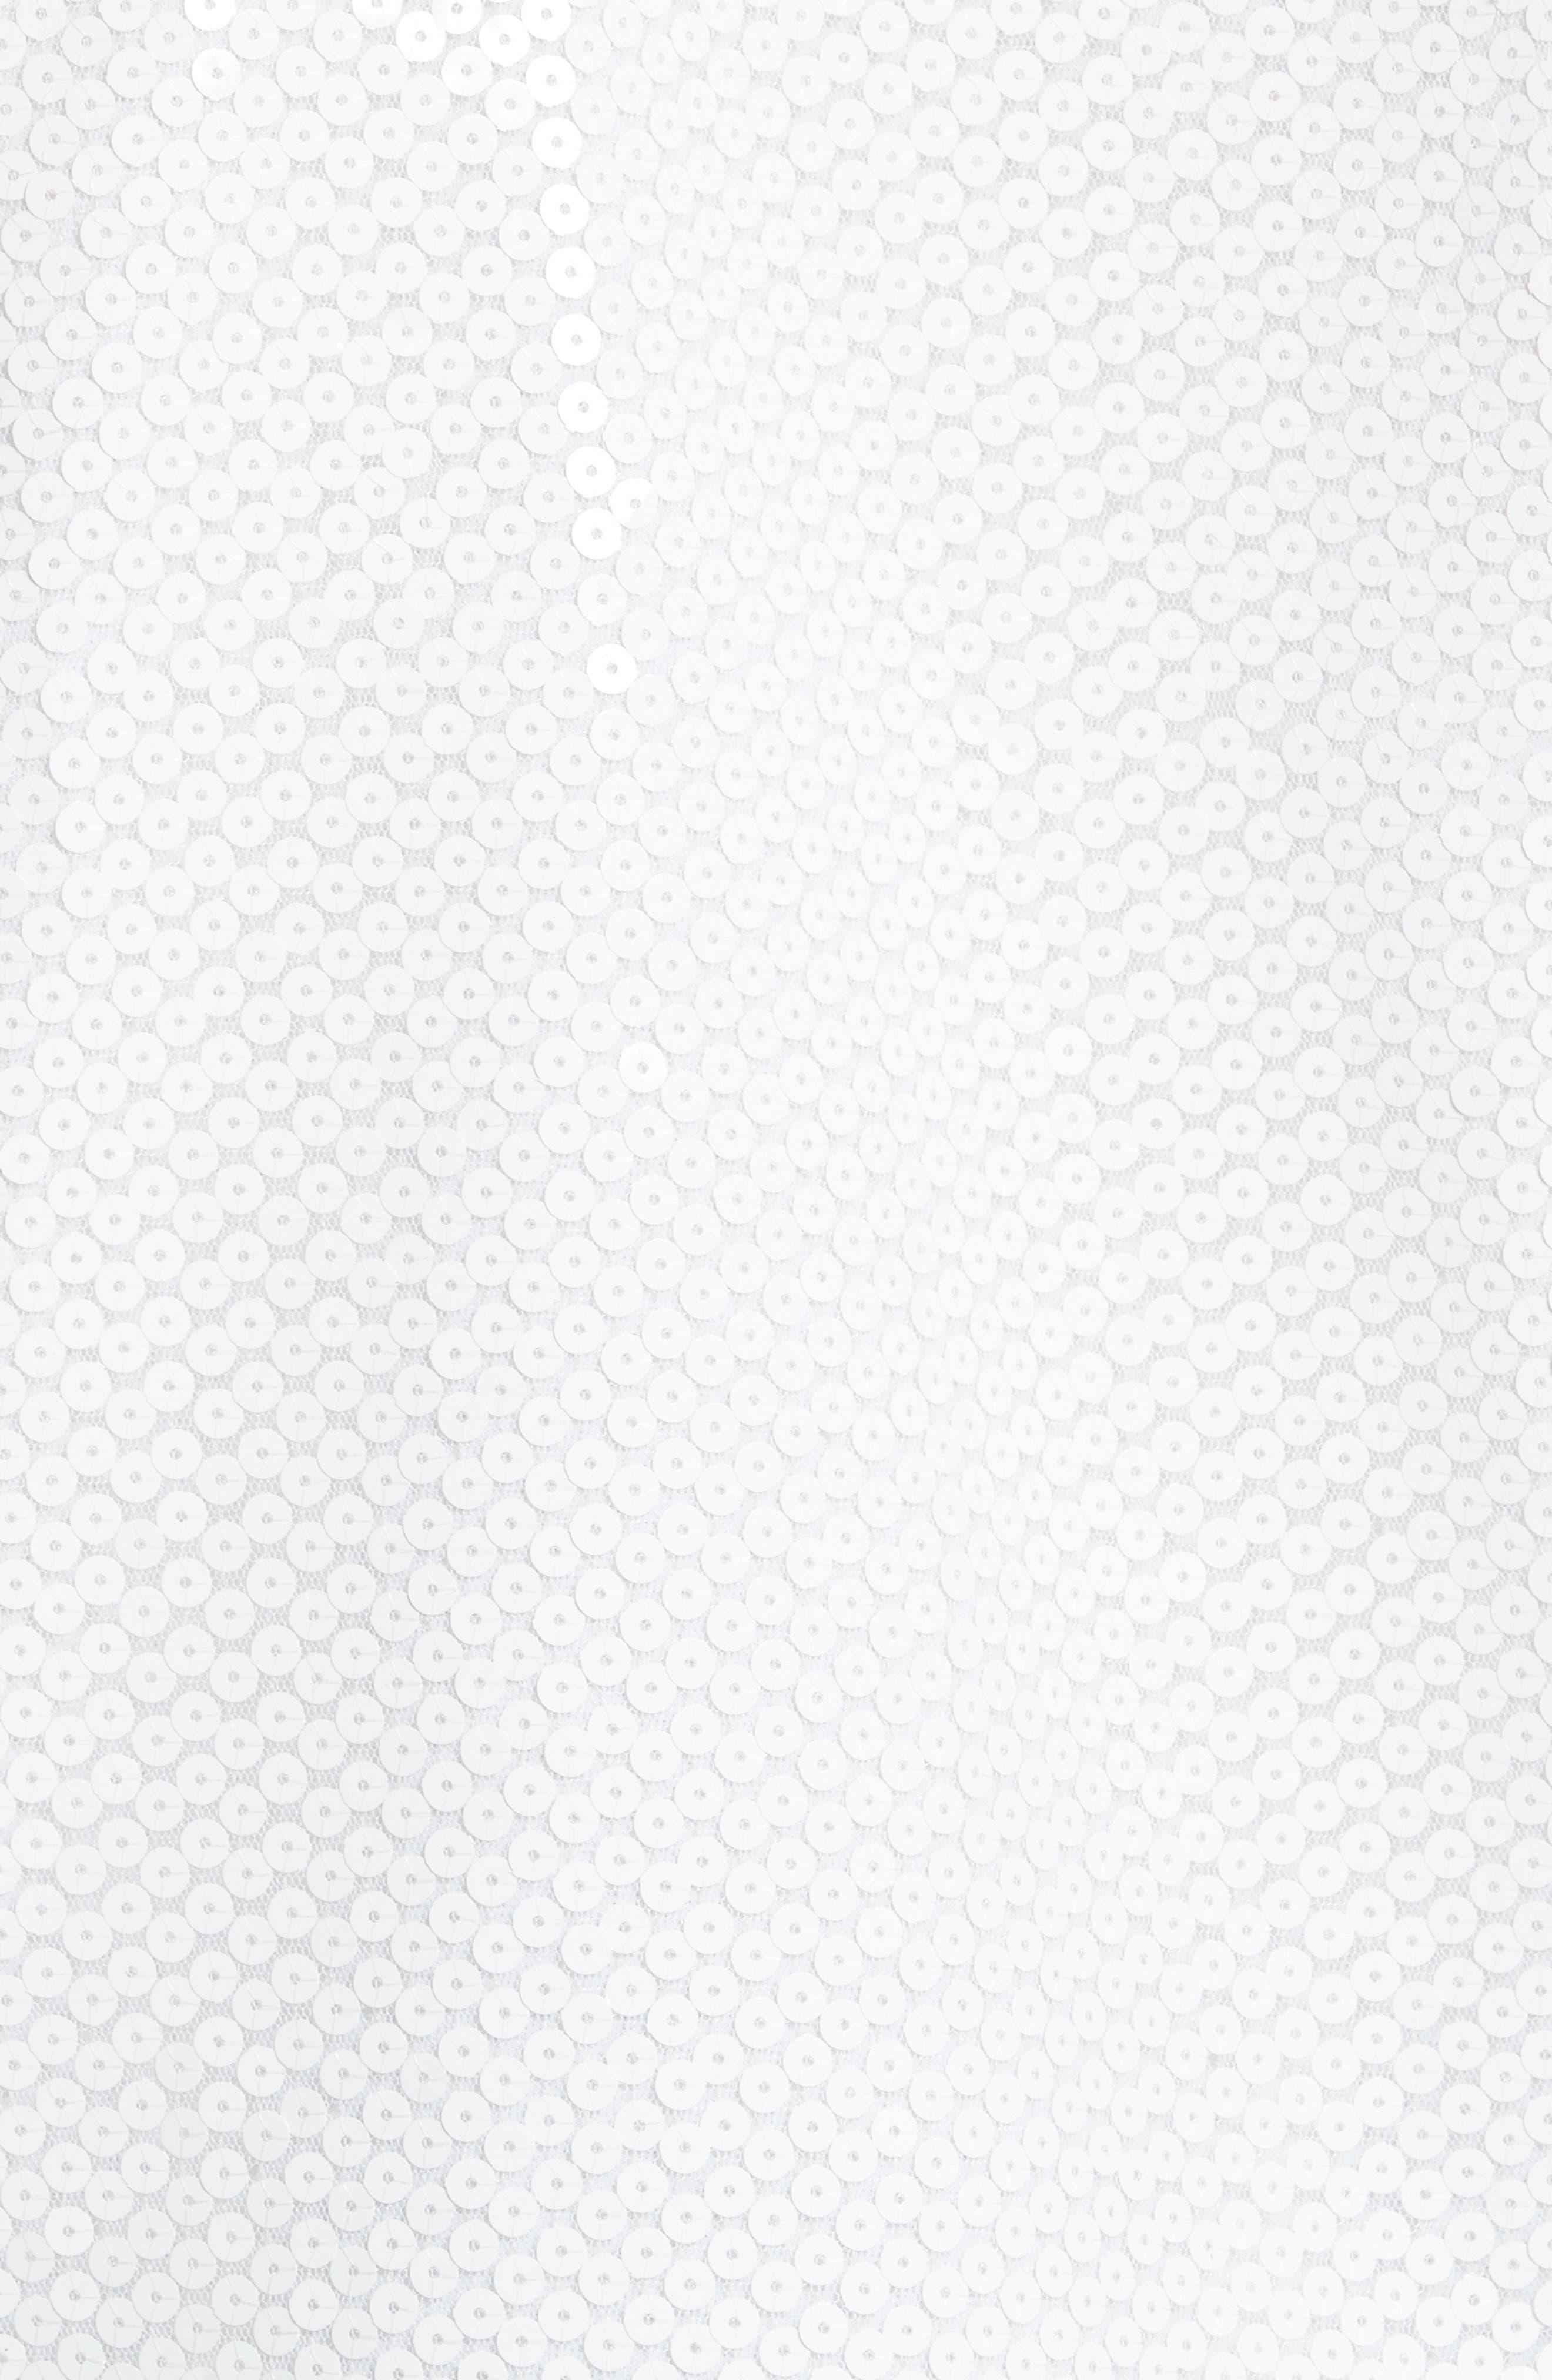 Sequin Back Sweatshirt,                             Alternate thumbnail 5, color,                             White